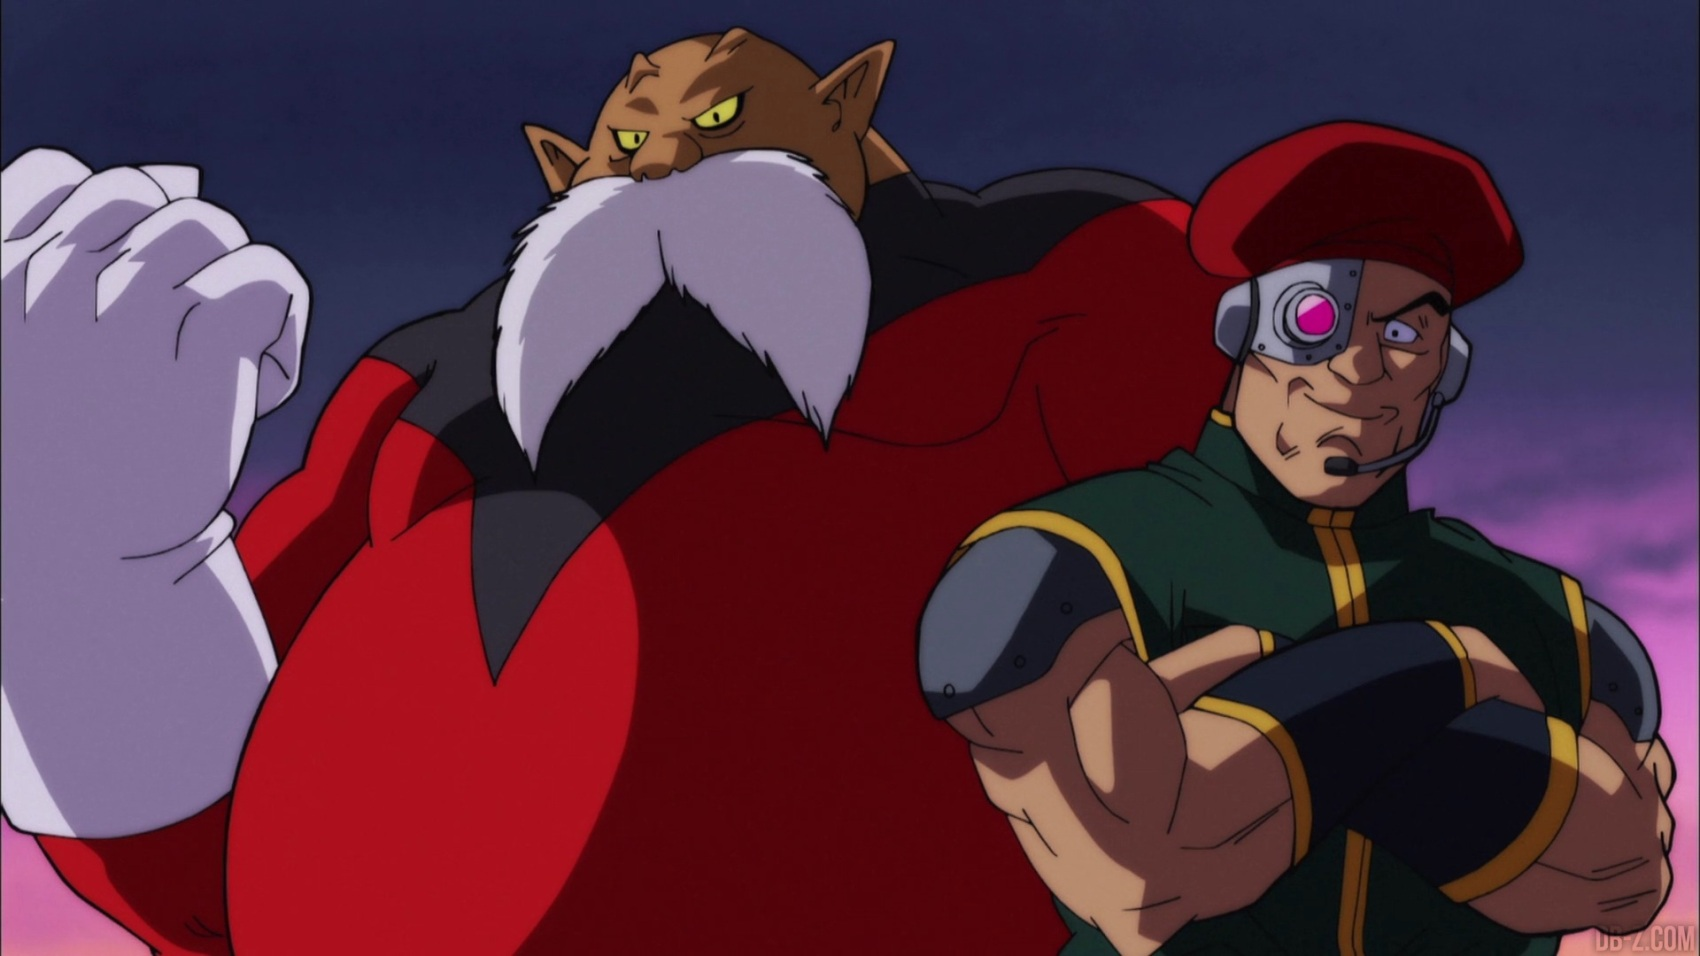 Dragon-Ball-Super-Episode-85-0246872017-04-09-12-16-28